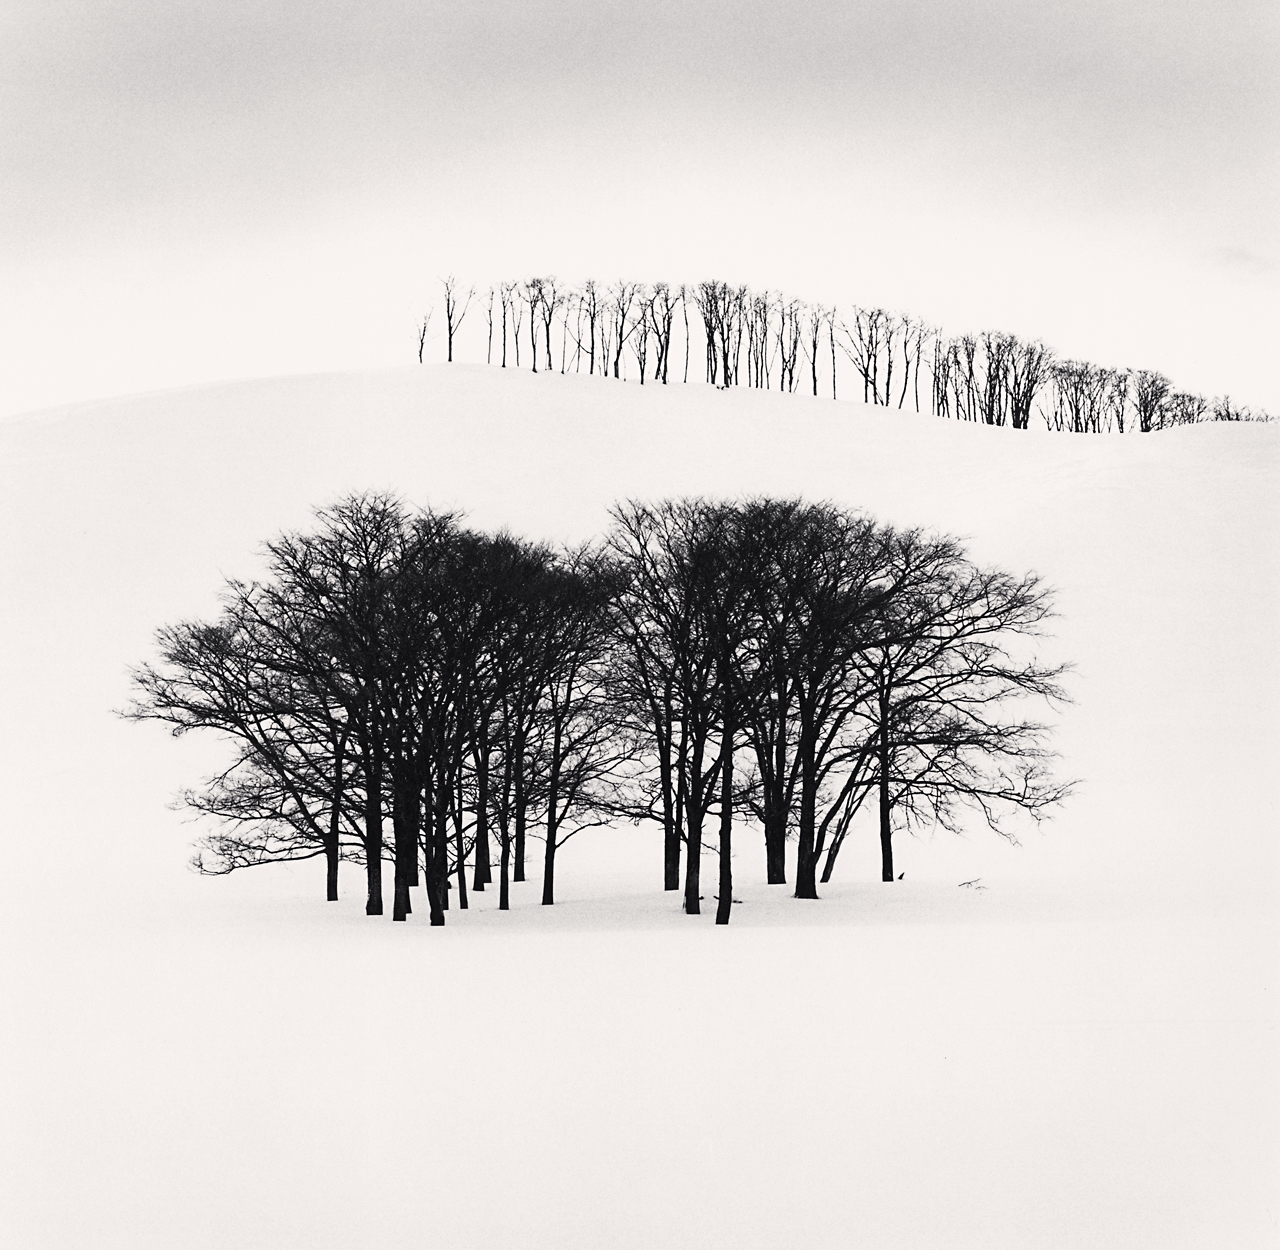 HIlltop Trees, Study 3, Teshikaga, Hokkaido, Japan. 2004 .jpg